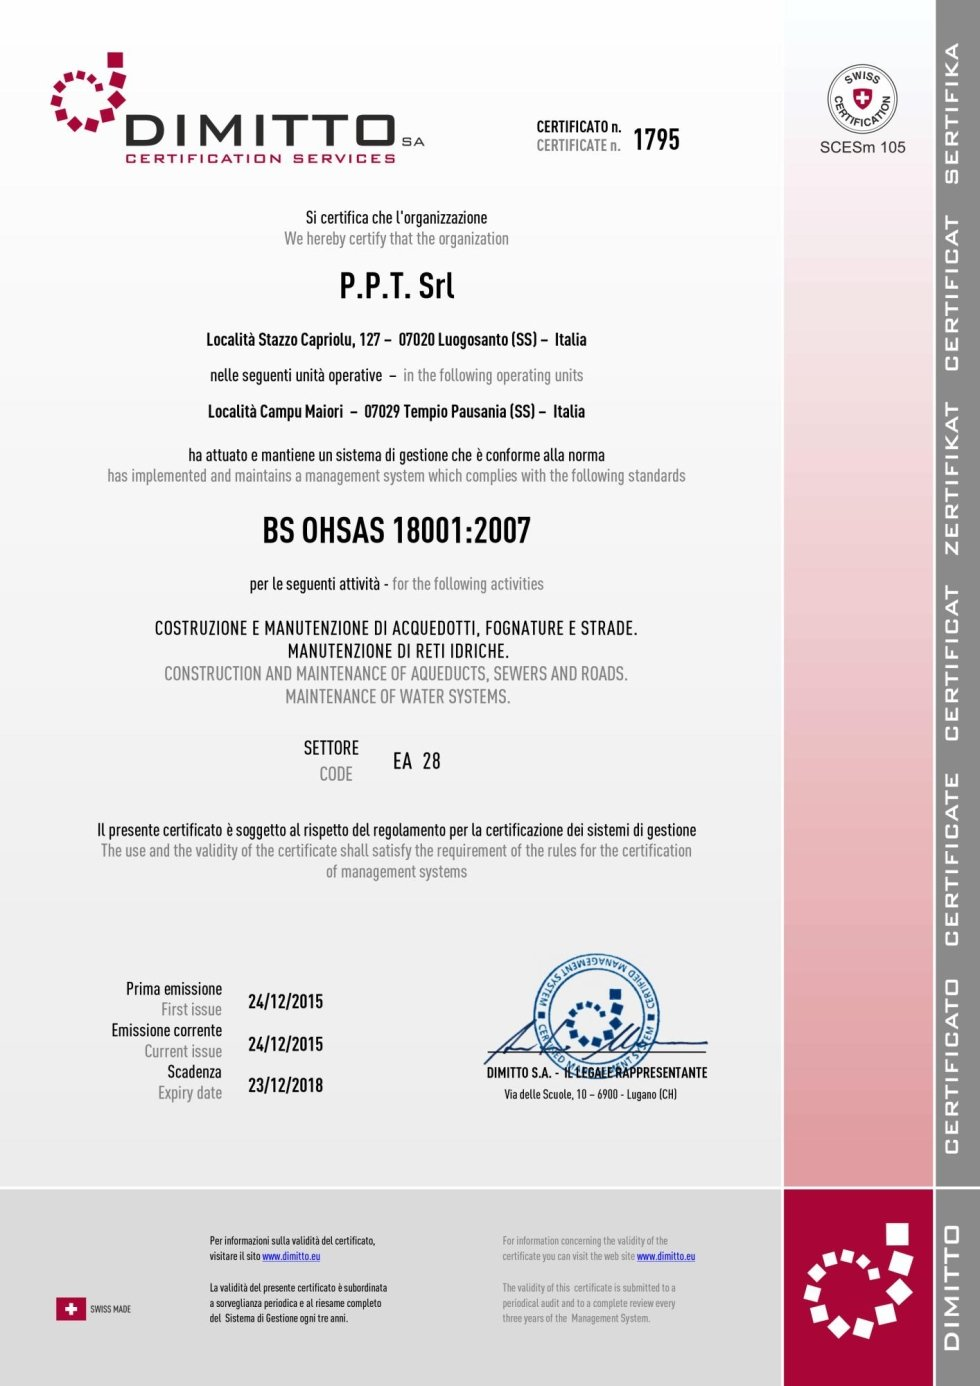 CERTIFICATO BS OHSAS 18001-2007